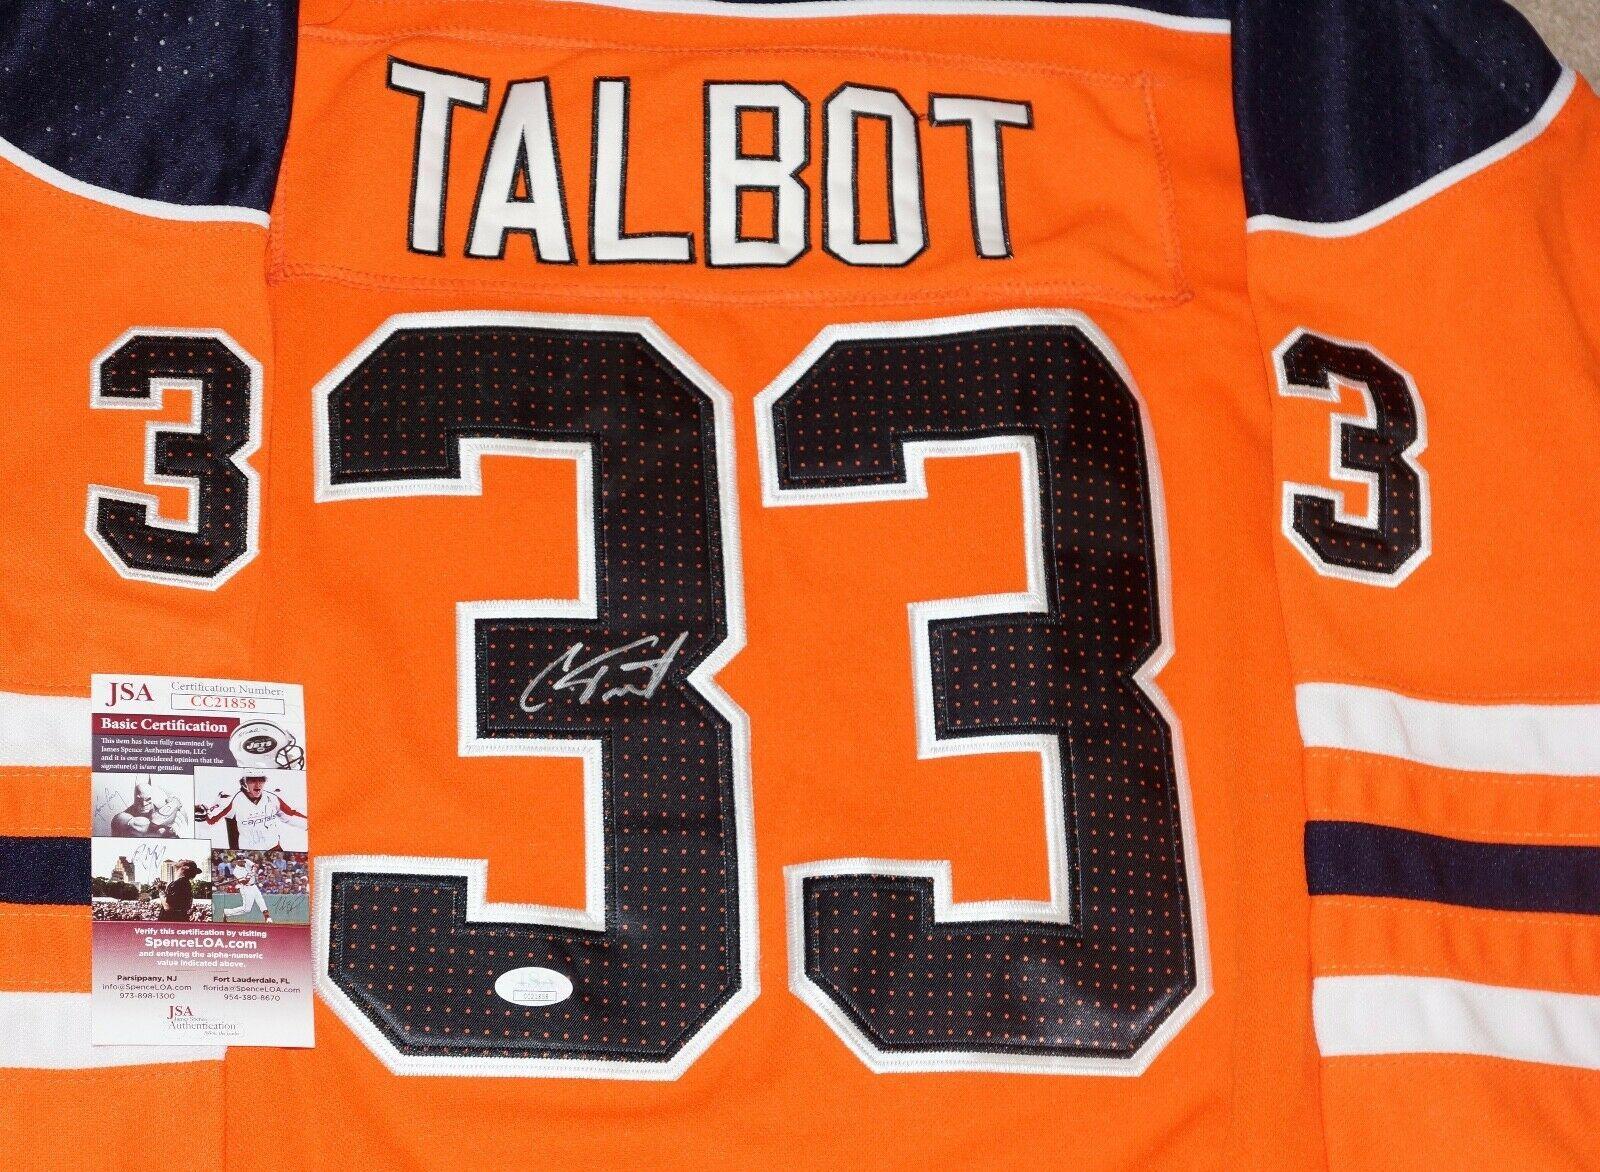 pretty nice 5a25b a385b Signed Cam Talbot Jersey - #33 + COA #CC21858 - JSA Certified · The World  Table Hockey Association, Inc.